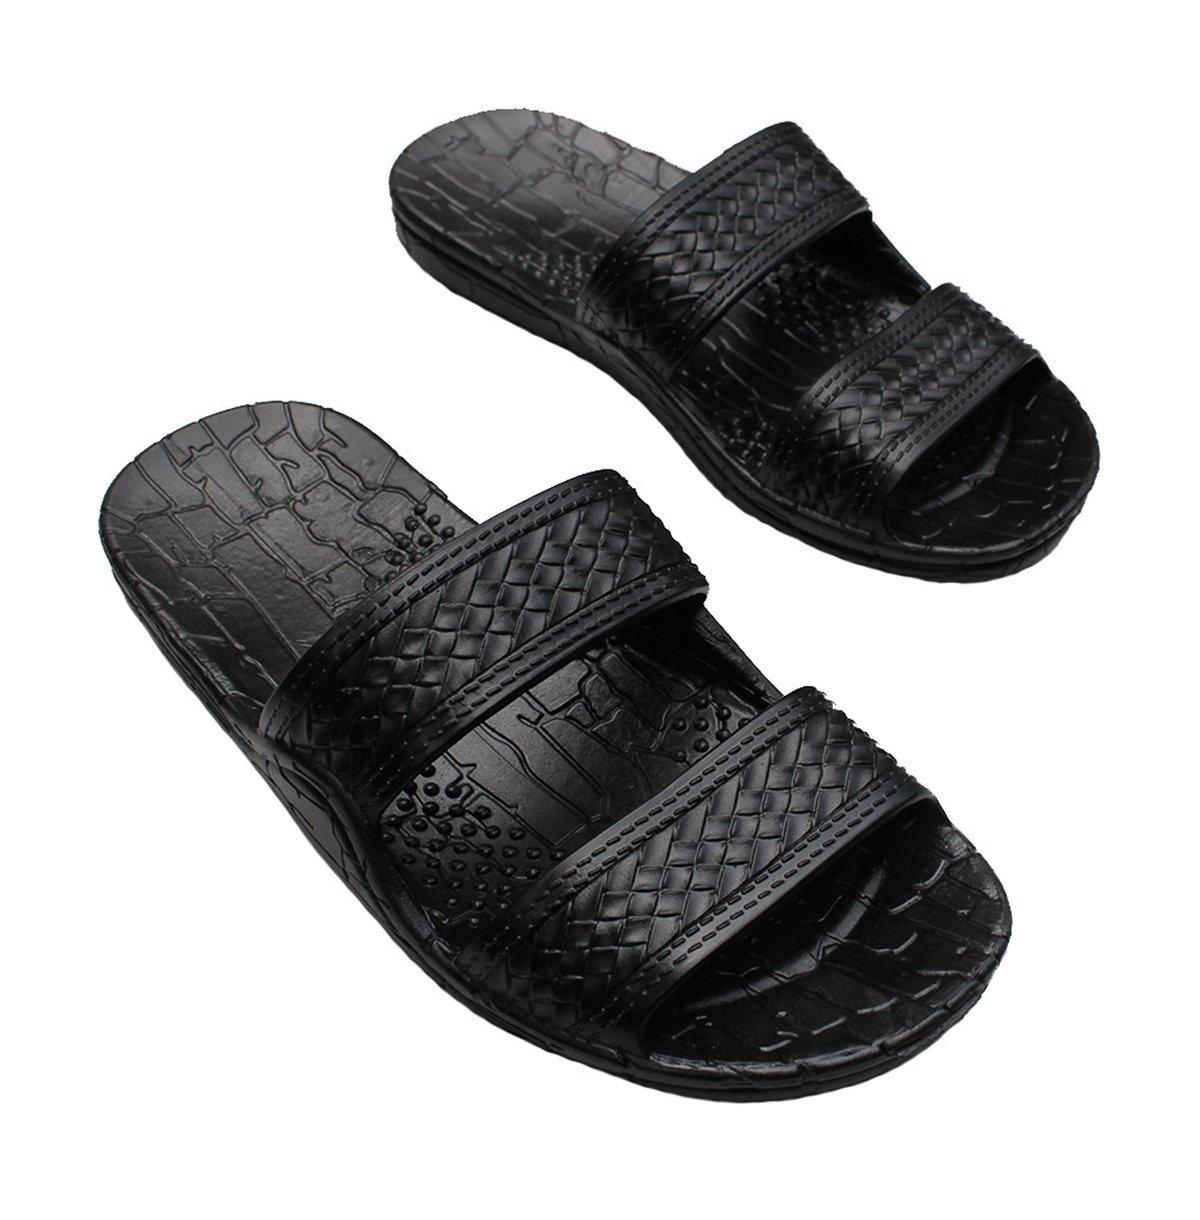 Imperial Sandals Hawaii Jesus Sandals